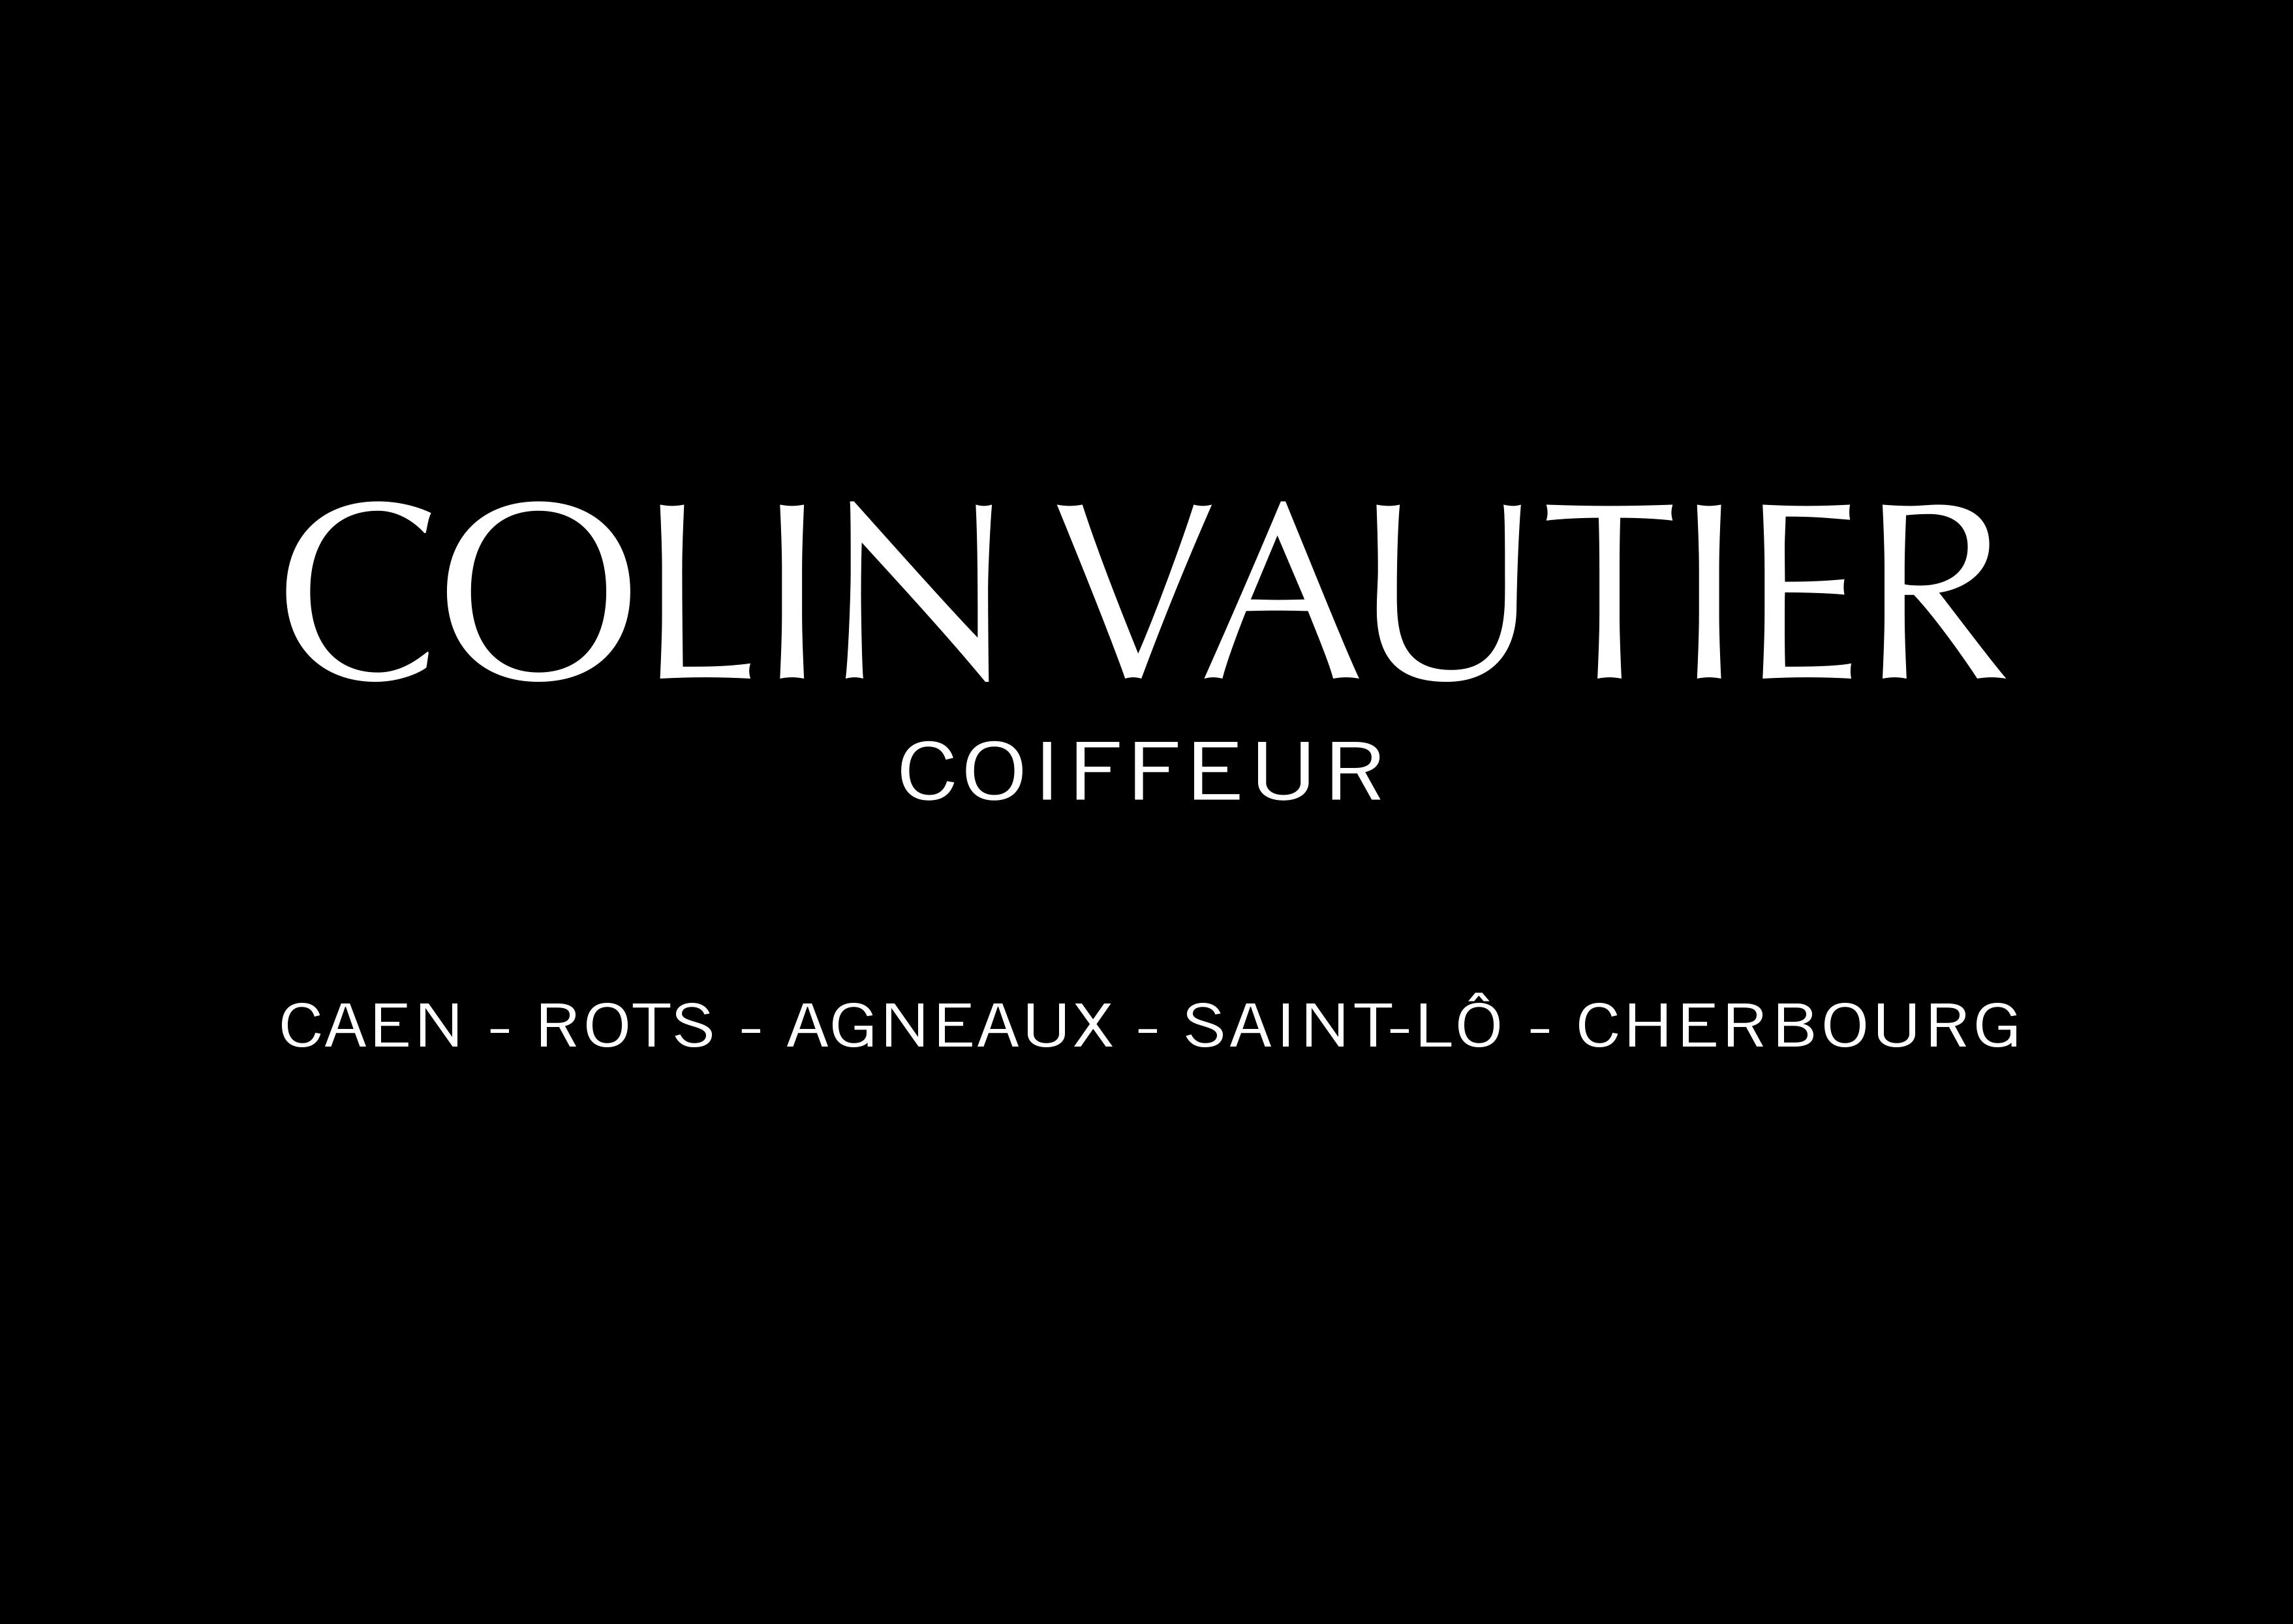 Colin Vautier Coiffeur - Cherbourg-Octeville